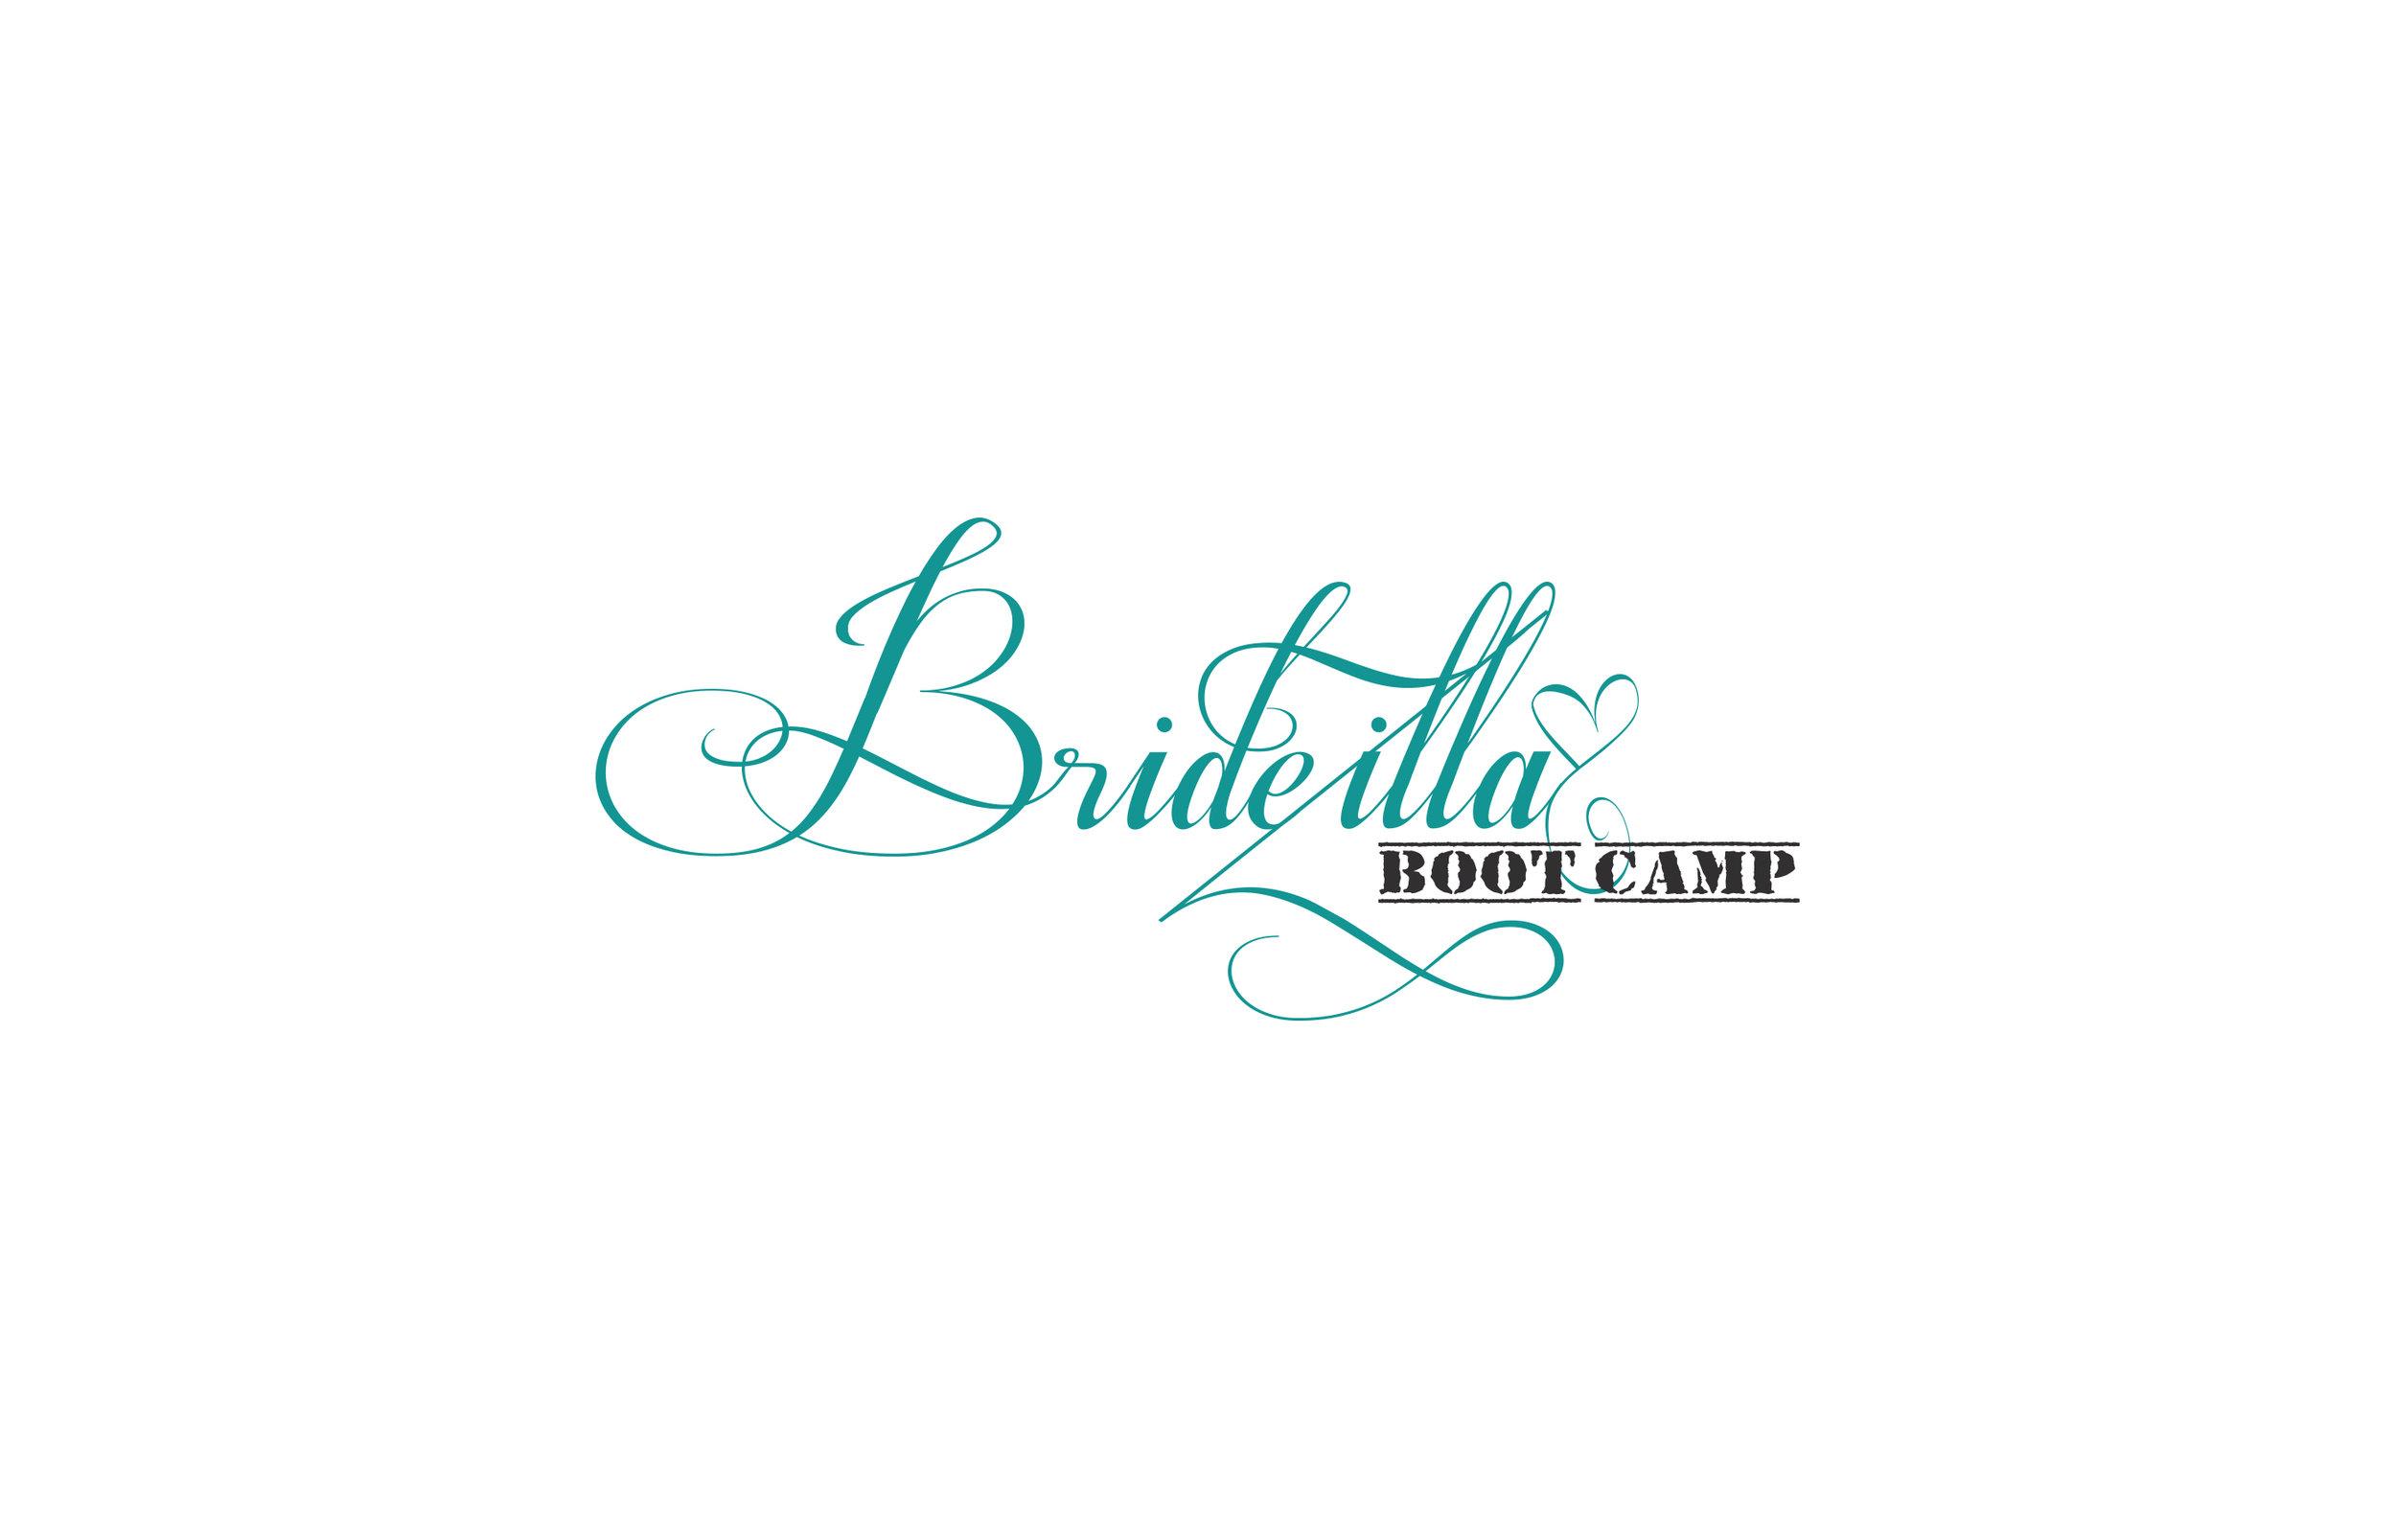 2018_TDP_2800x1800_Brand_Bridezilla2.jpg